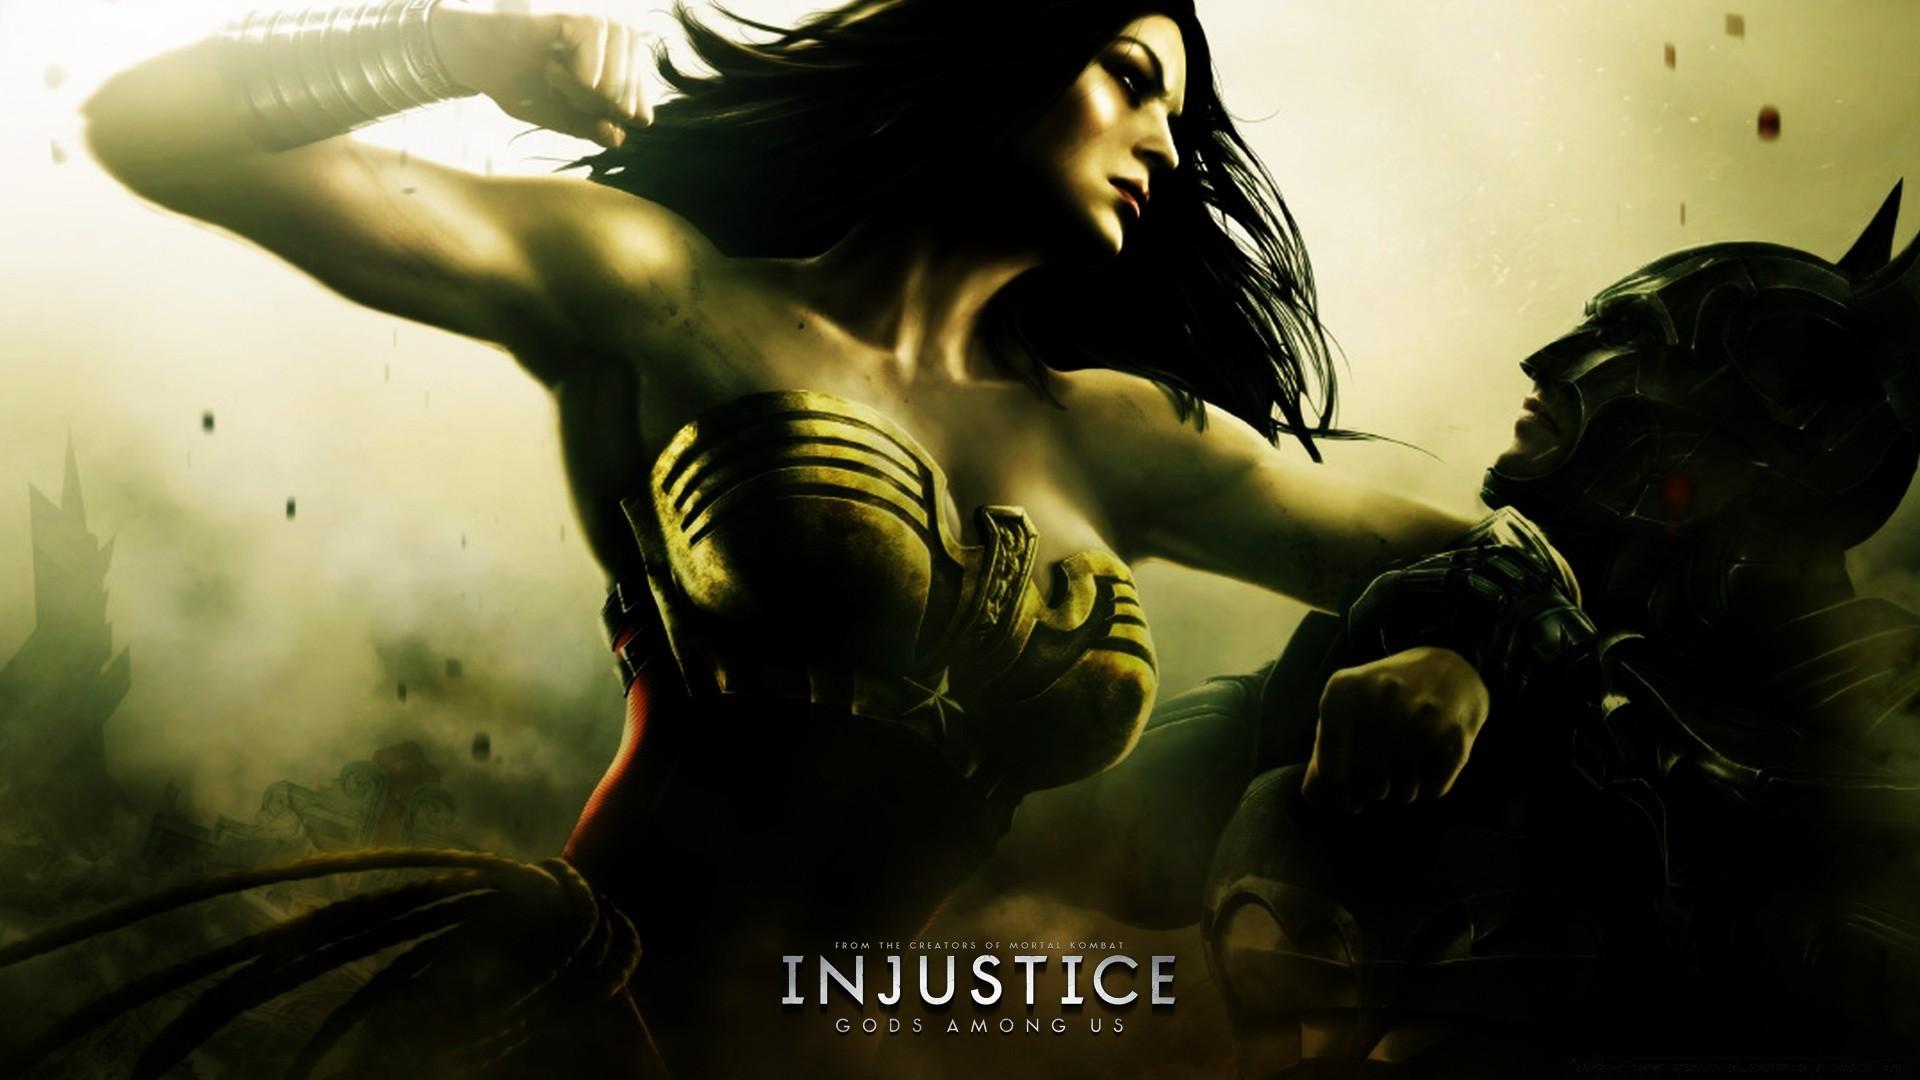 Injustice gods among us batman vs wonder woman android wallpapers injustice gods among us batman vs wonder woman android wallpapers for free voltagebd Gallery